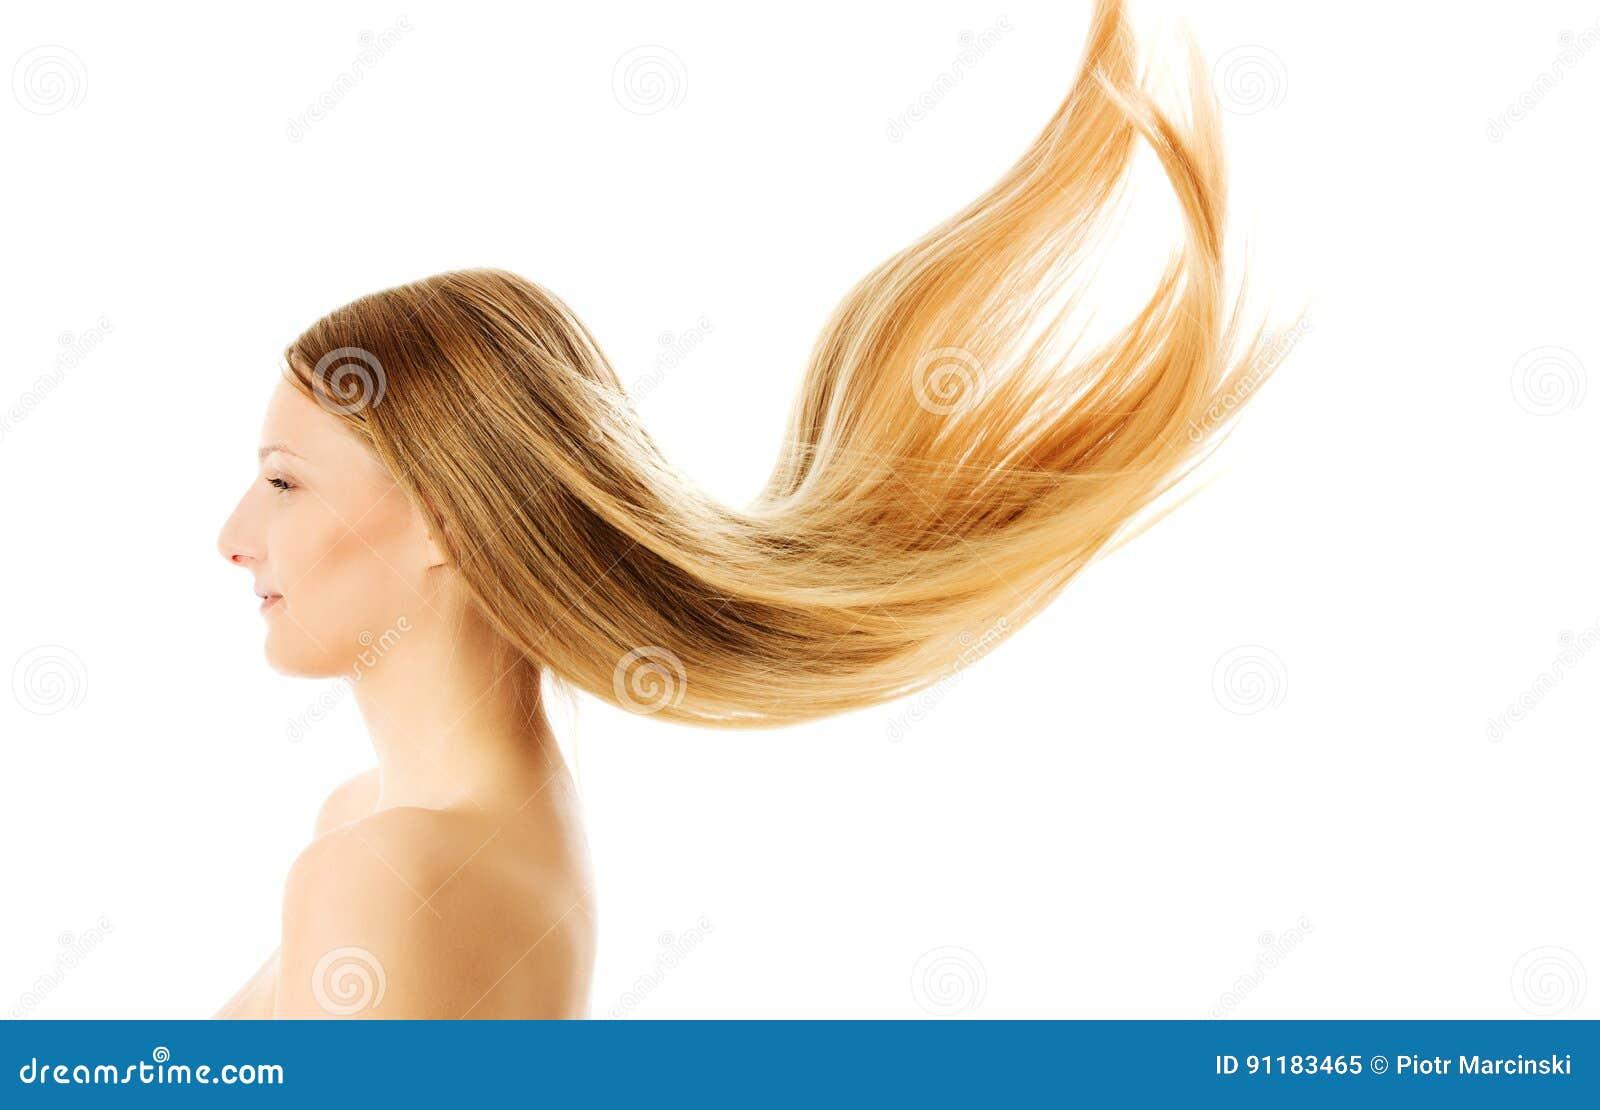 Schones Langes Blondes Haar Lokalisiert Auf Weiss Stockbild Bild